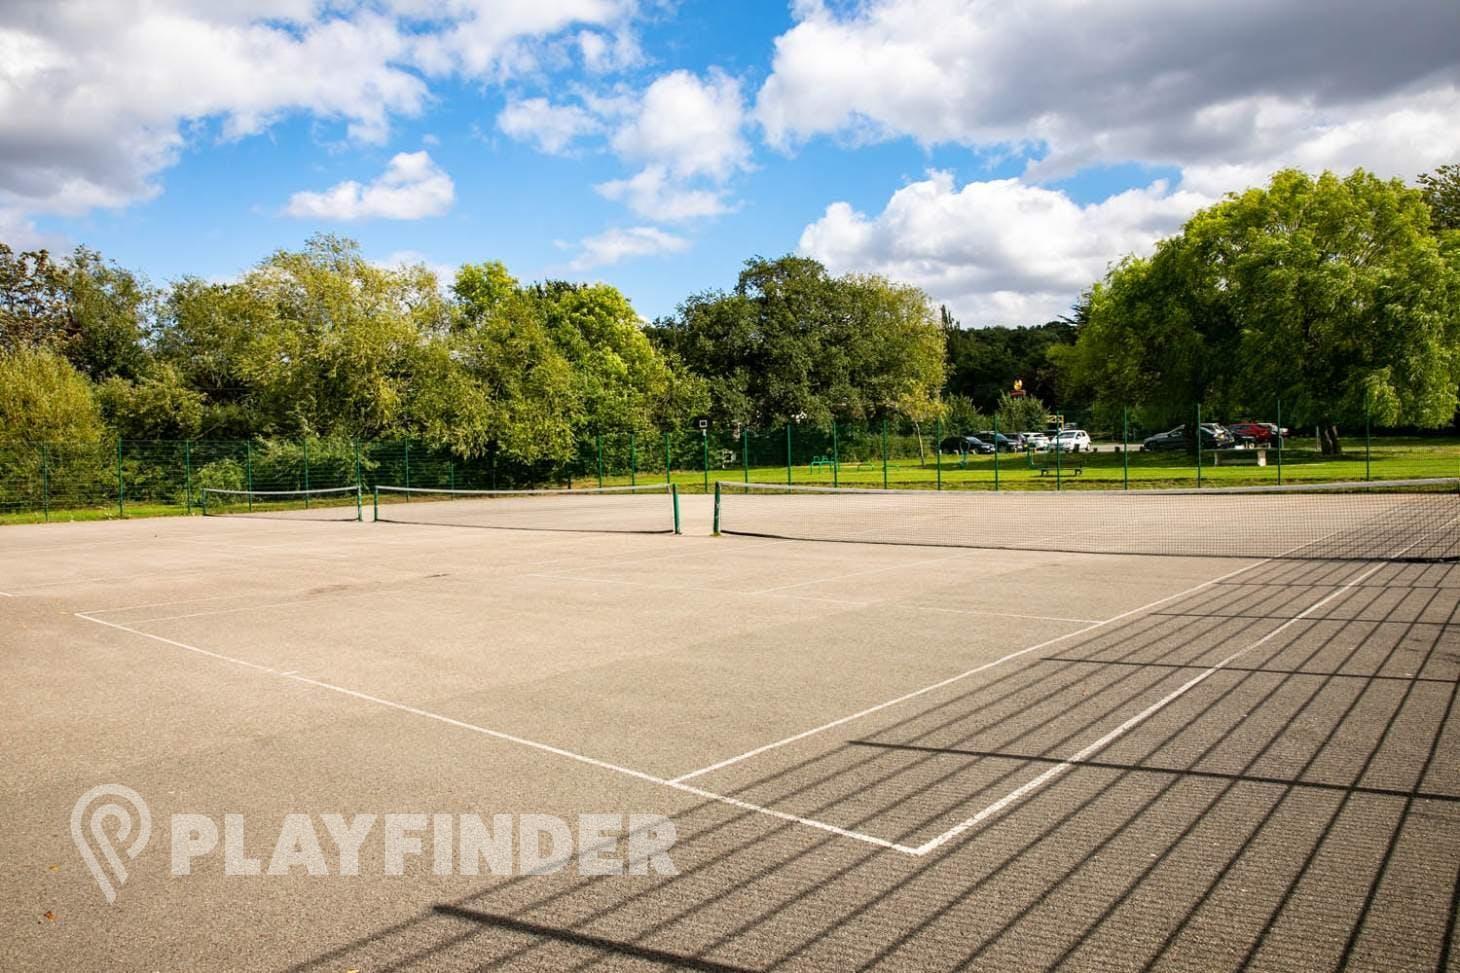 Berkeley Fields Outdoor | Hard (macadam) tennis court